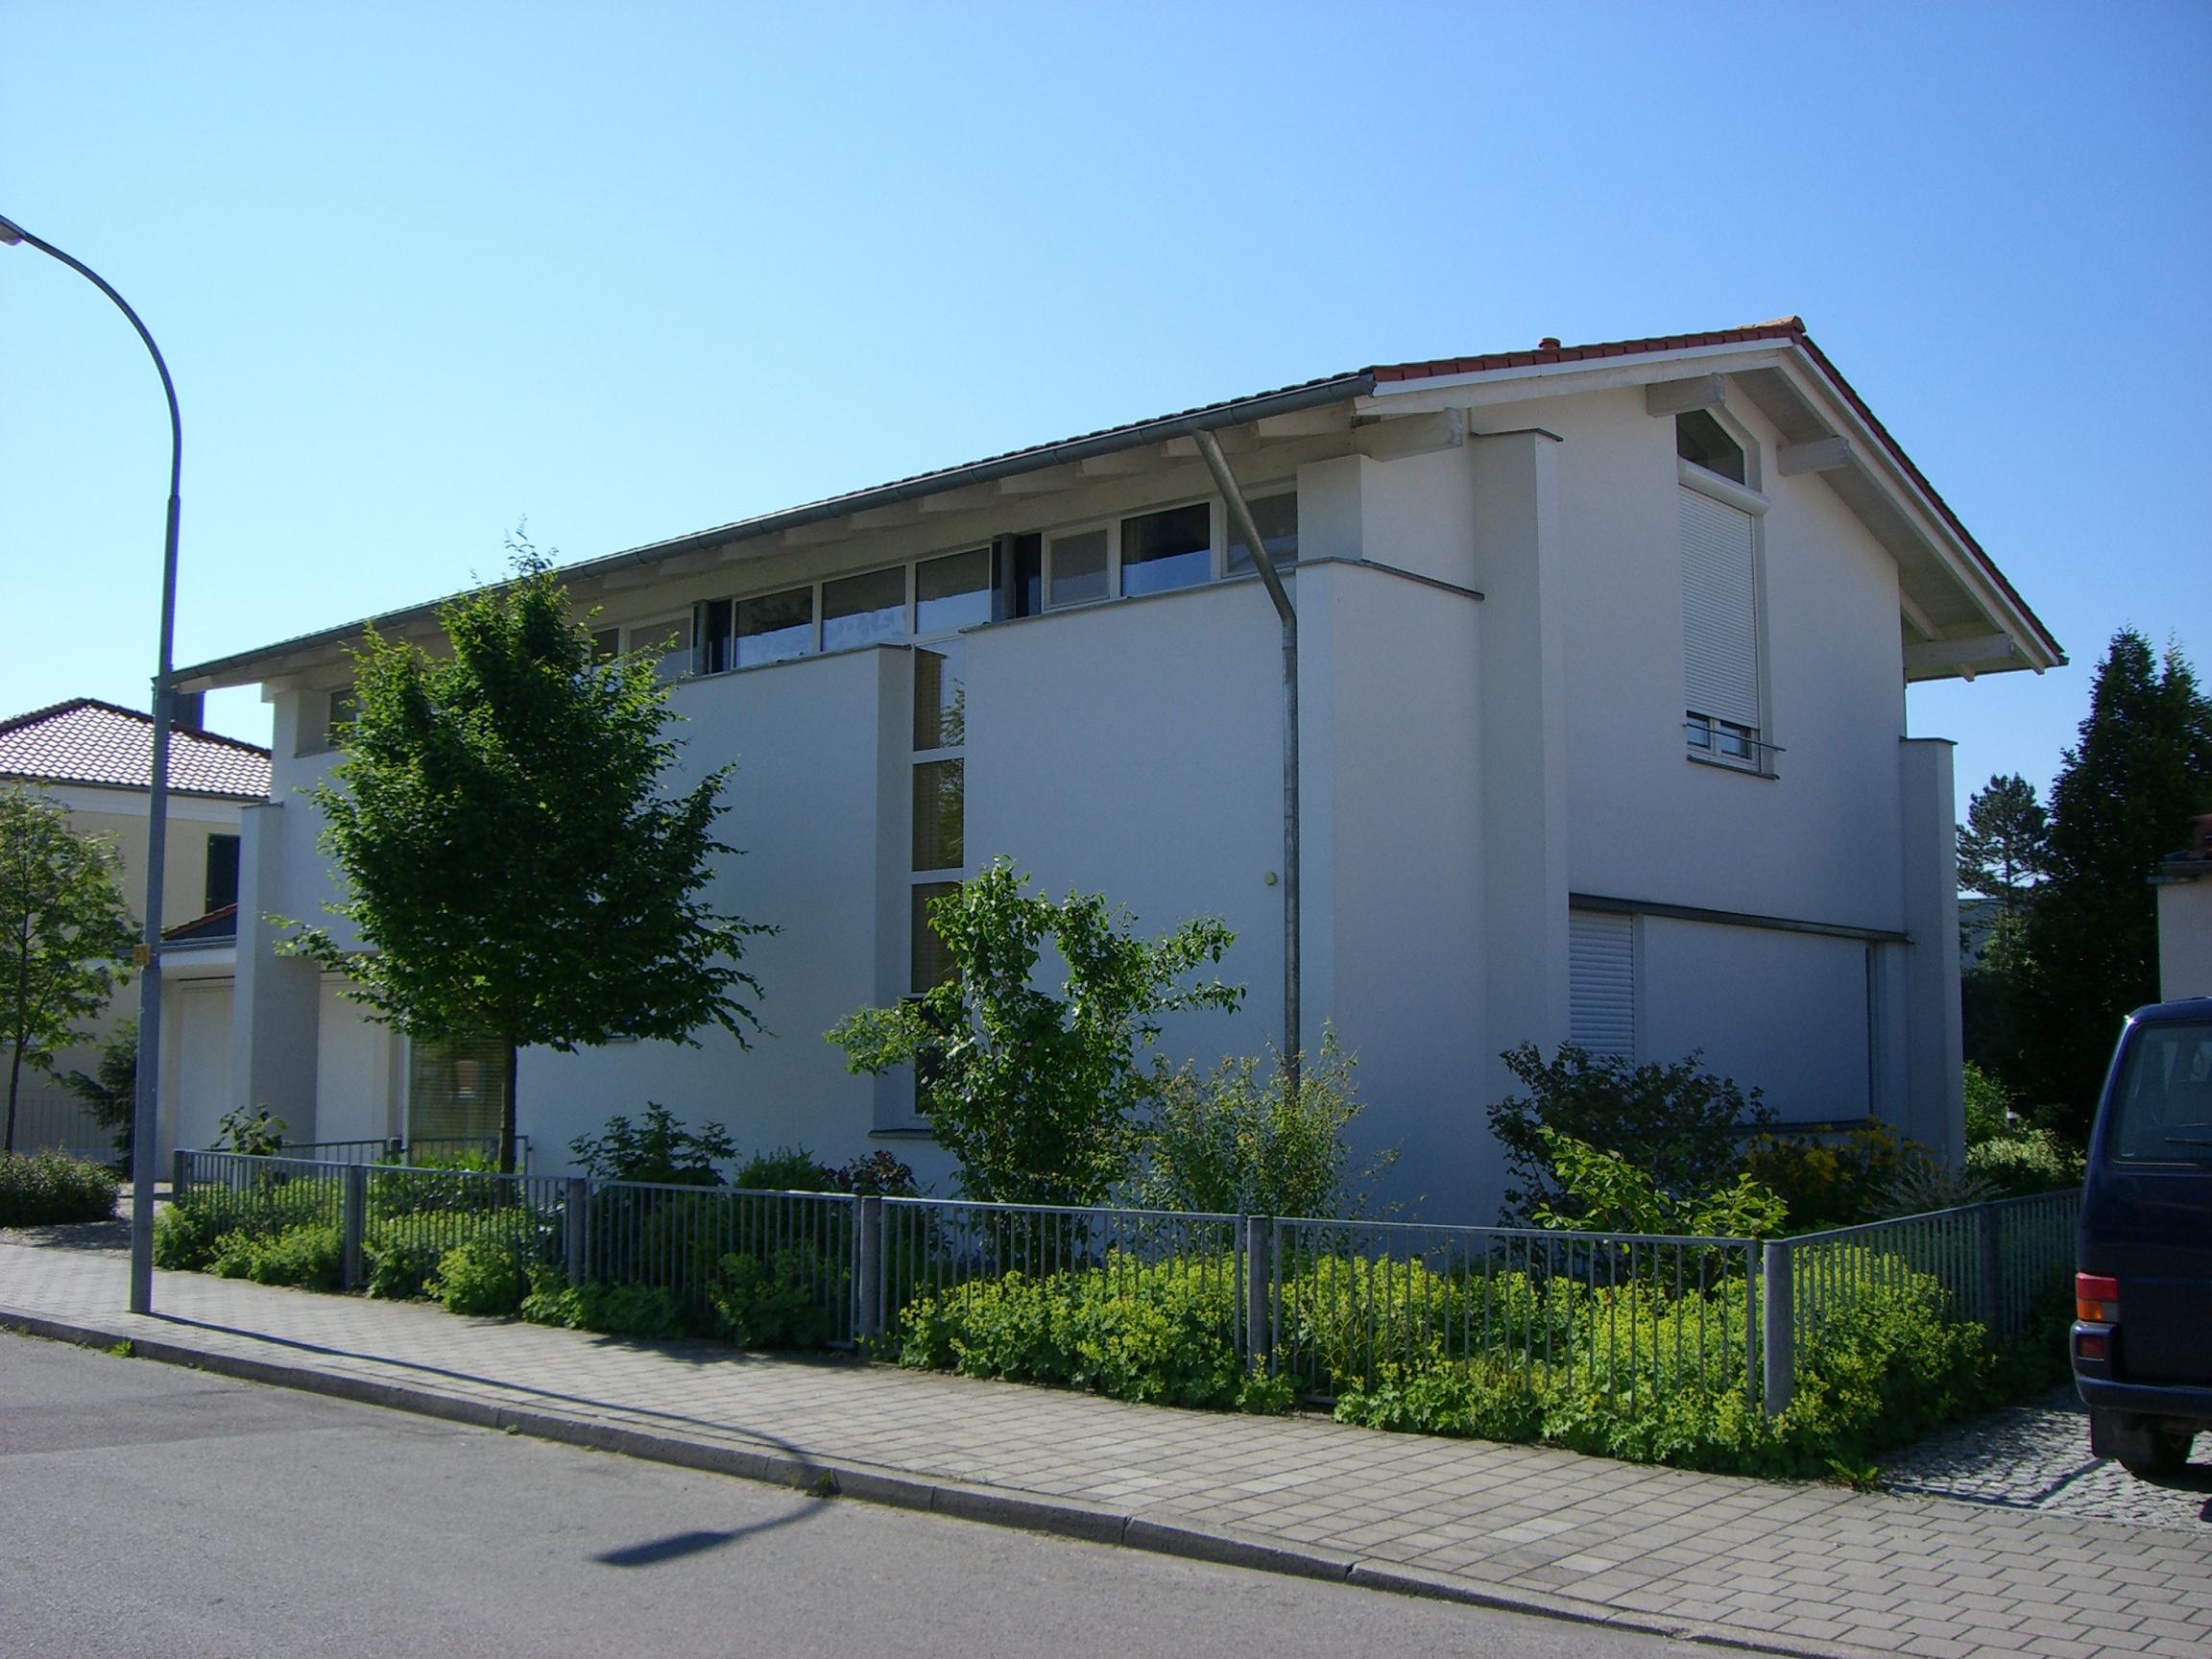 Baufirmen Ingolstadt froschmeier gmbh martin froschmeier bauunternehmung